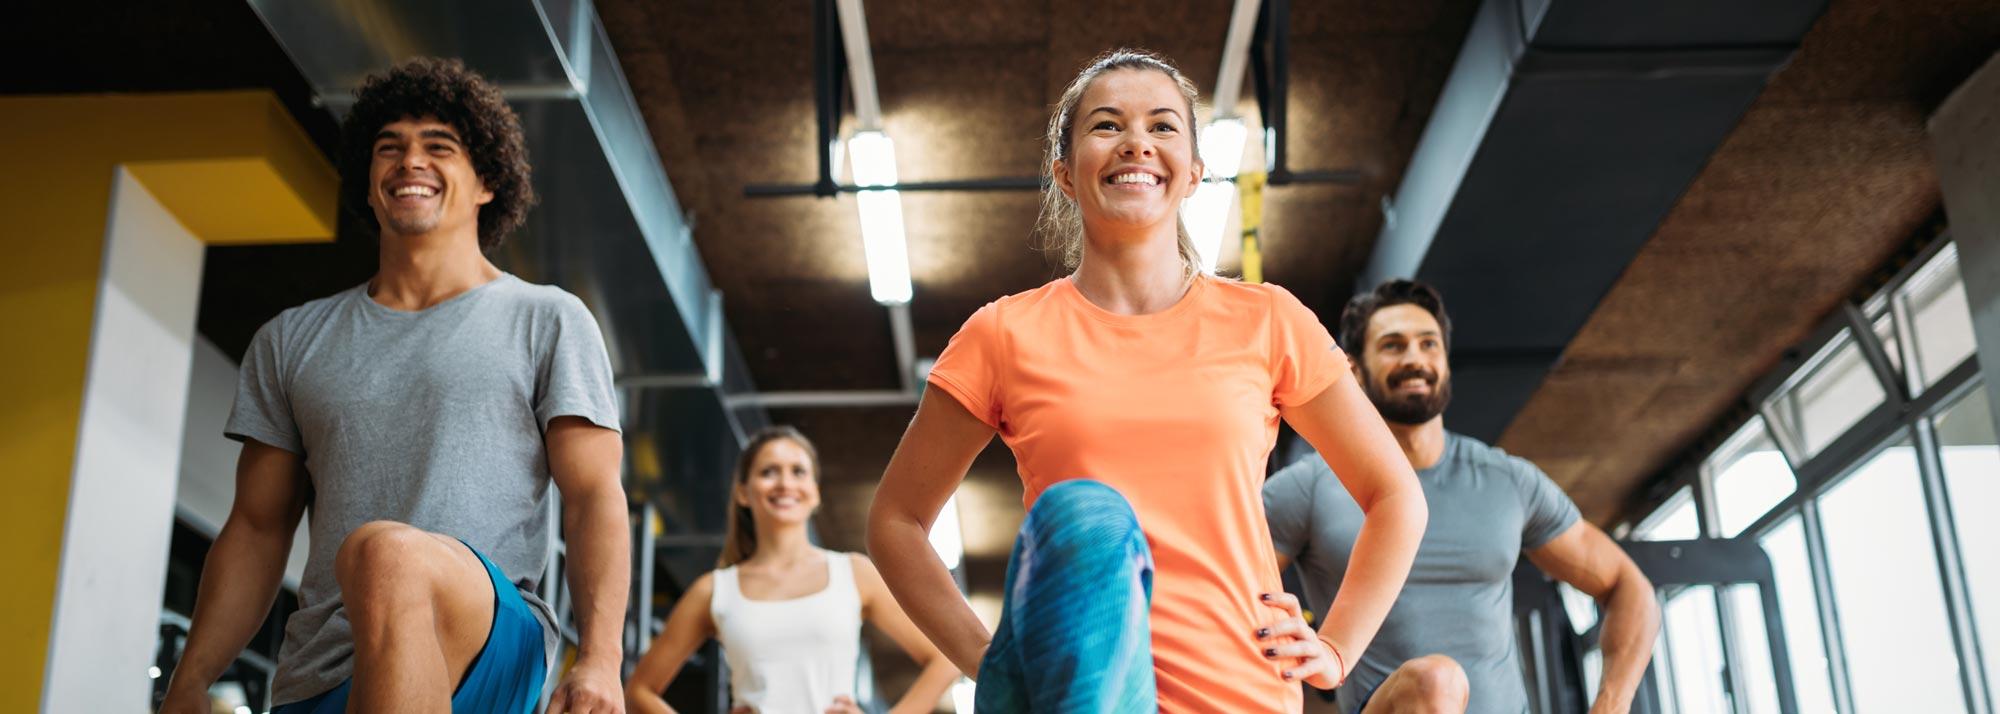 Texas Family Fitness Blog